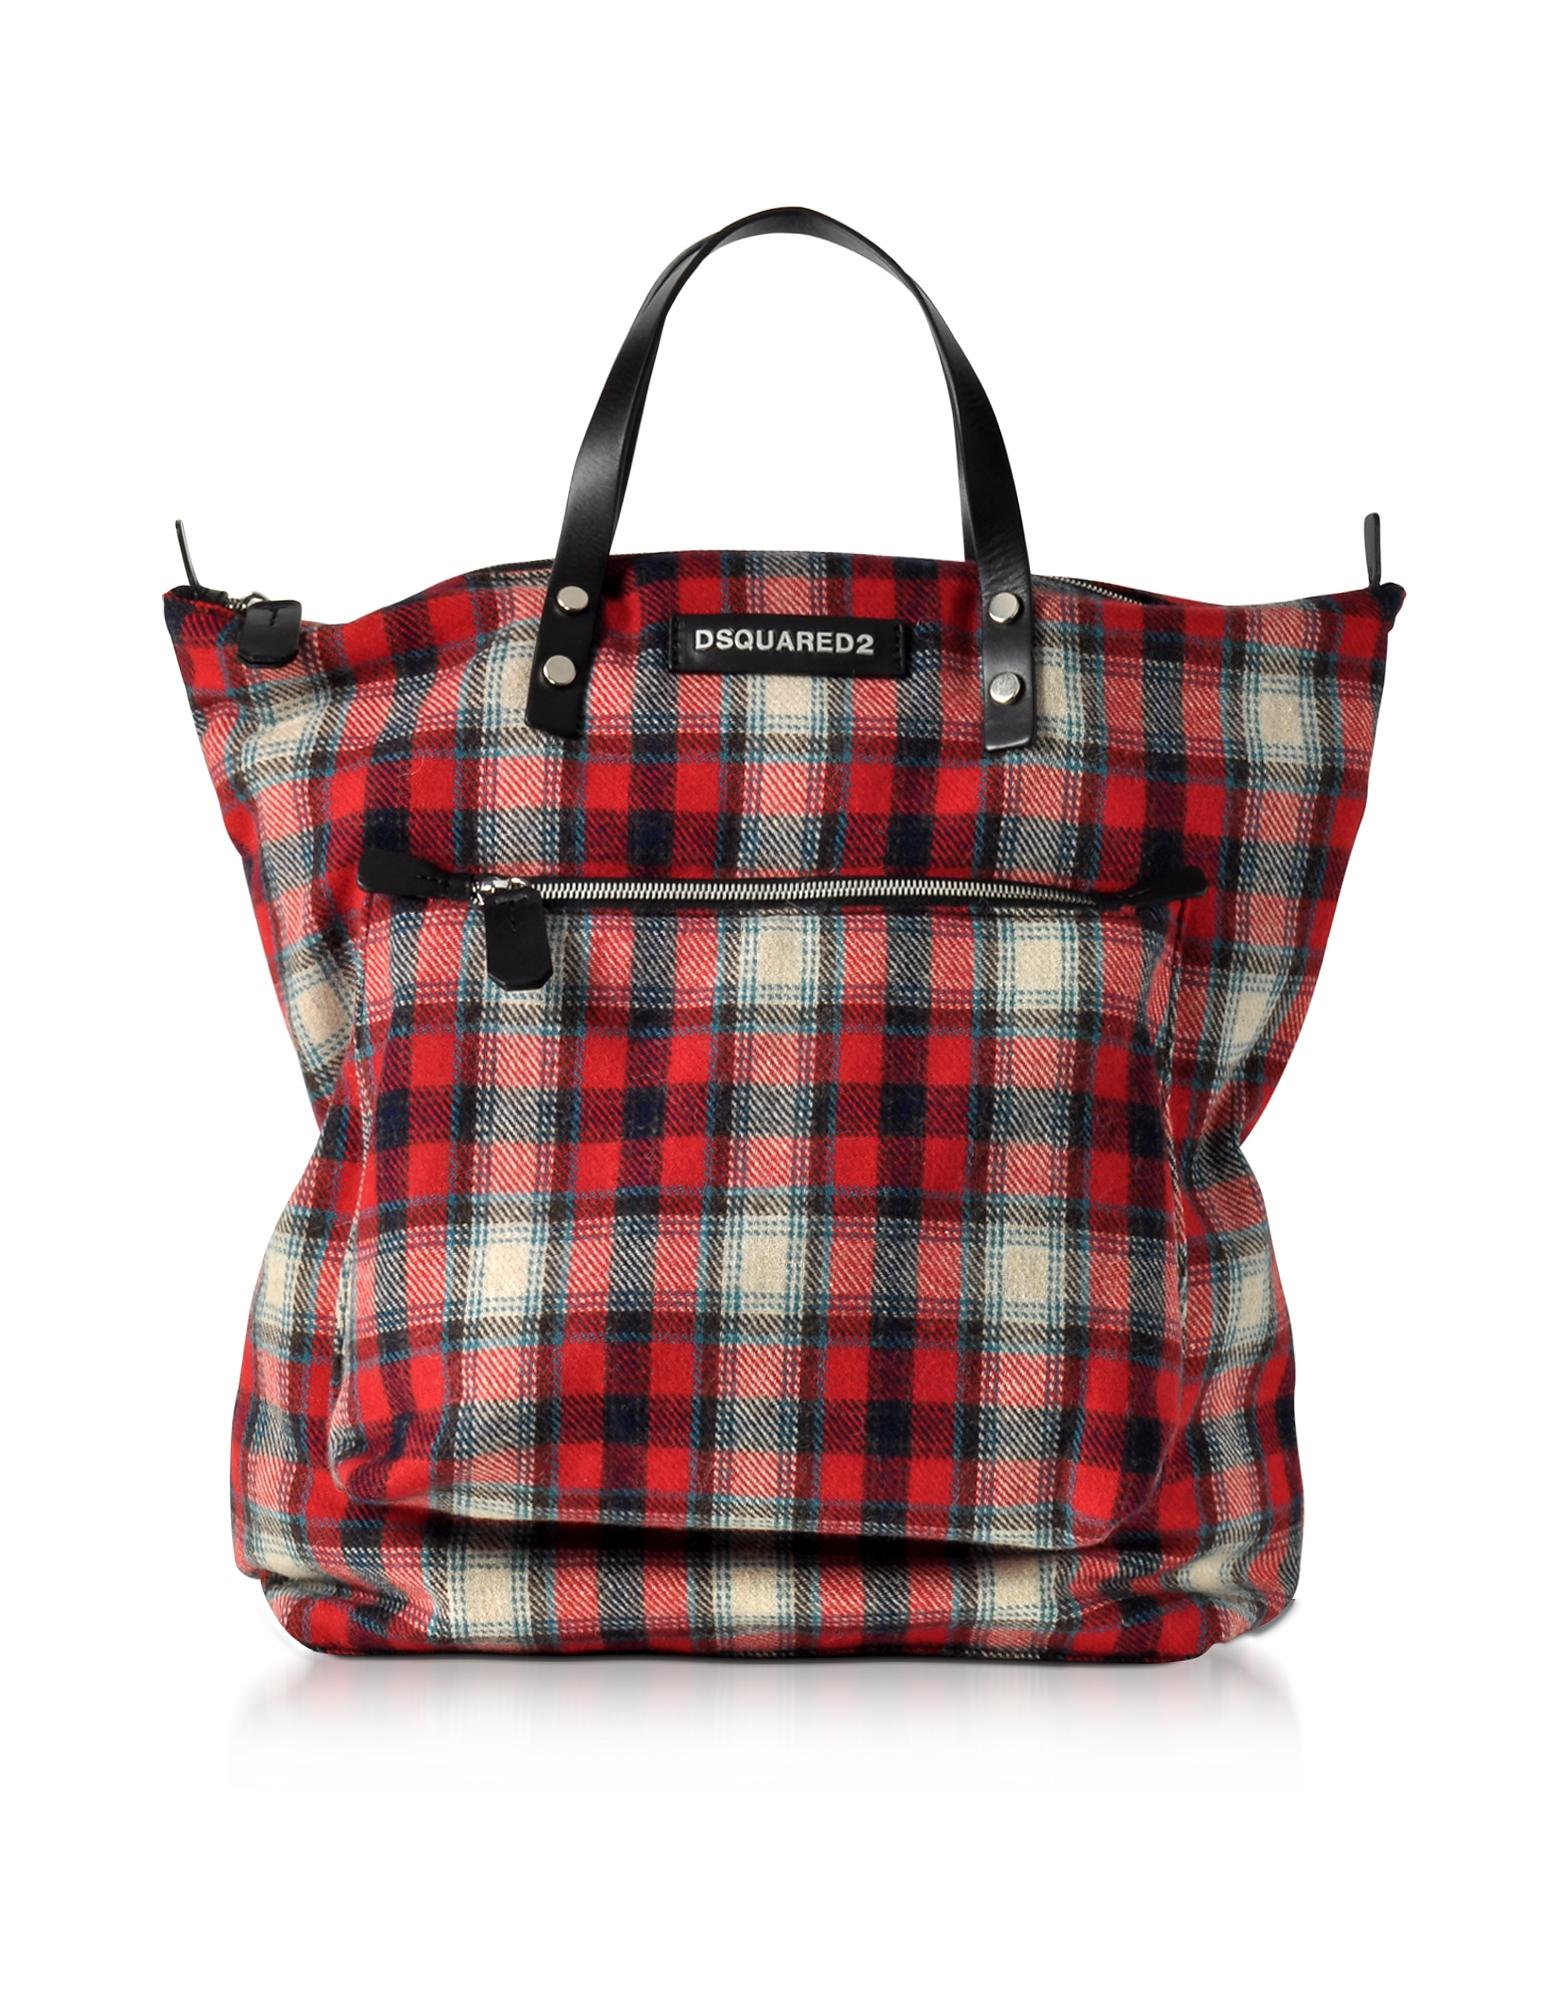 DSquared2 Men's Bags, Red Wool Blend Check Hiro Men's Tote Bag